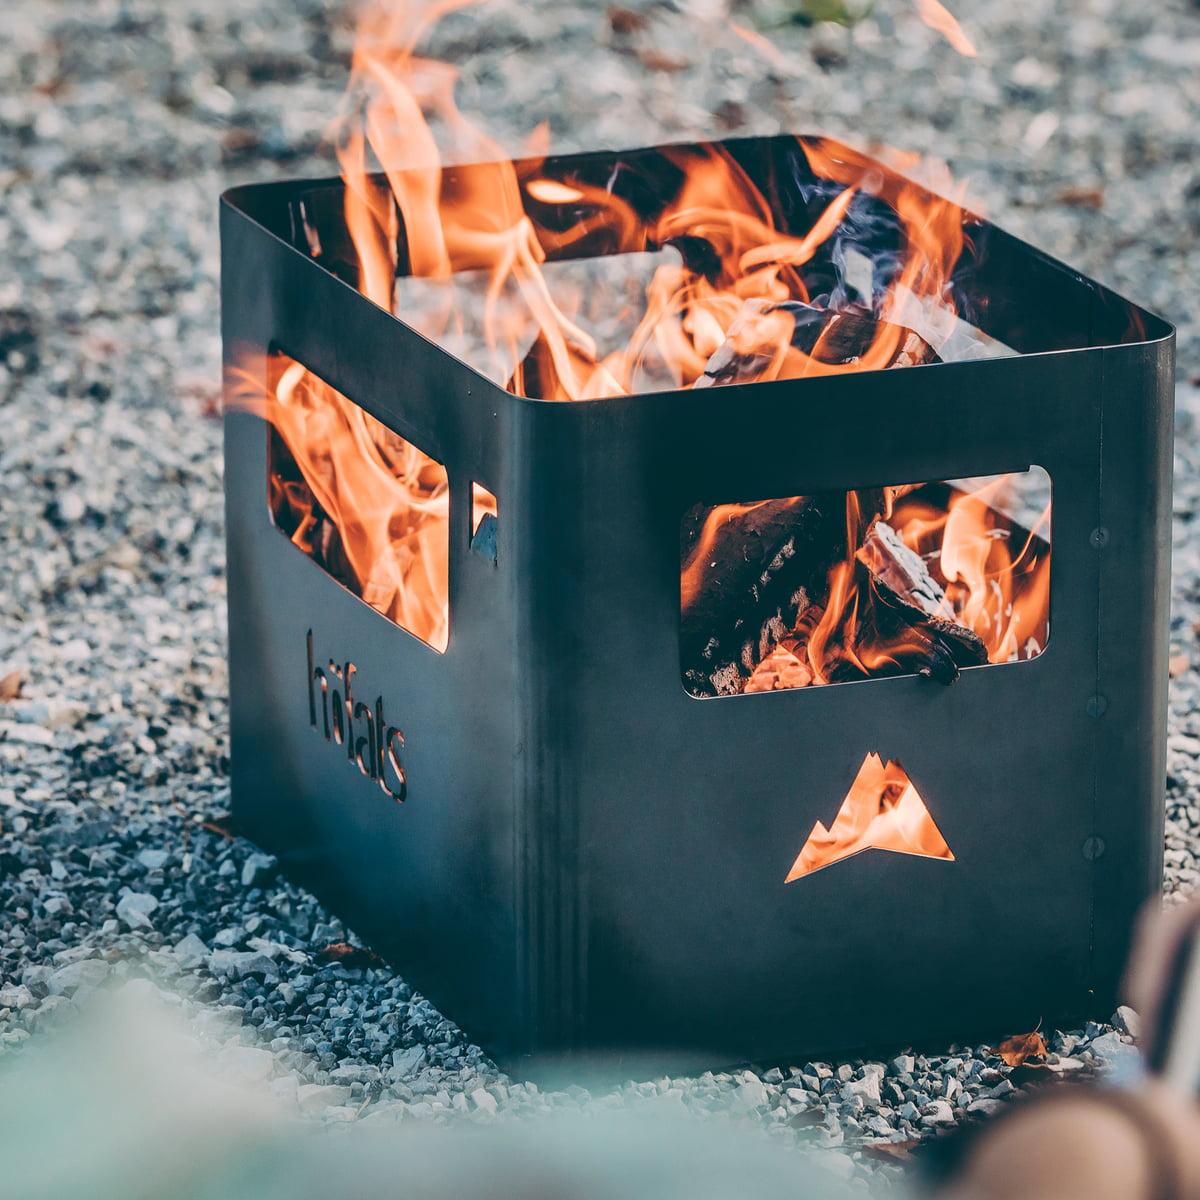 Beer Box Fire Basket Connox